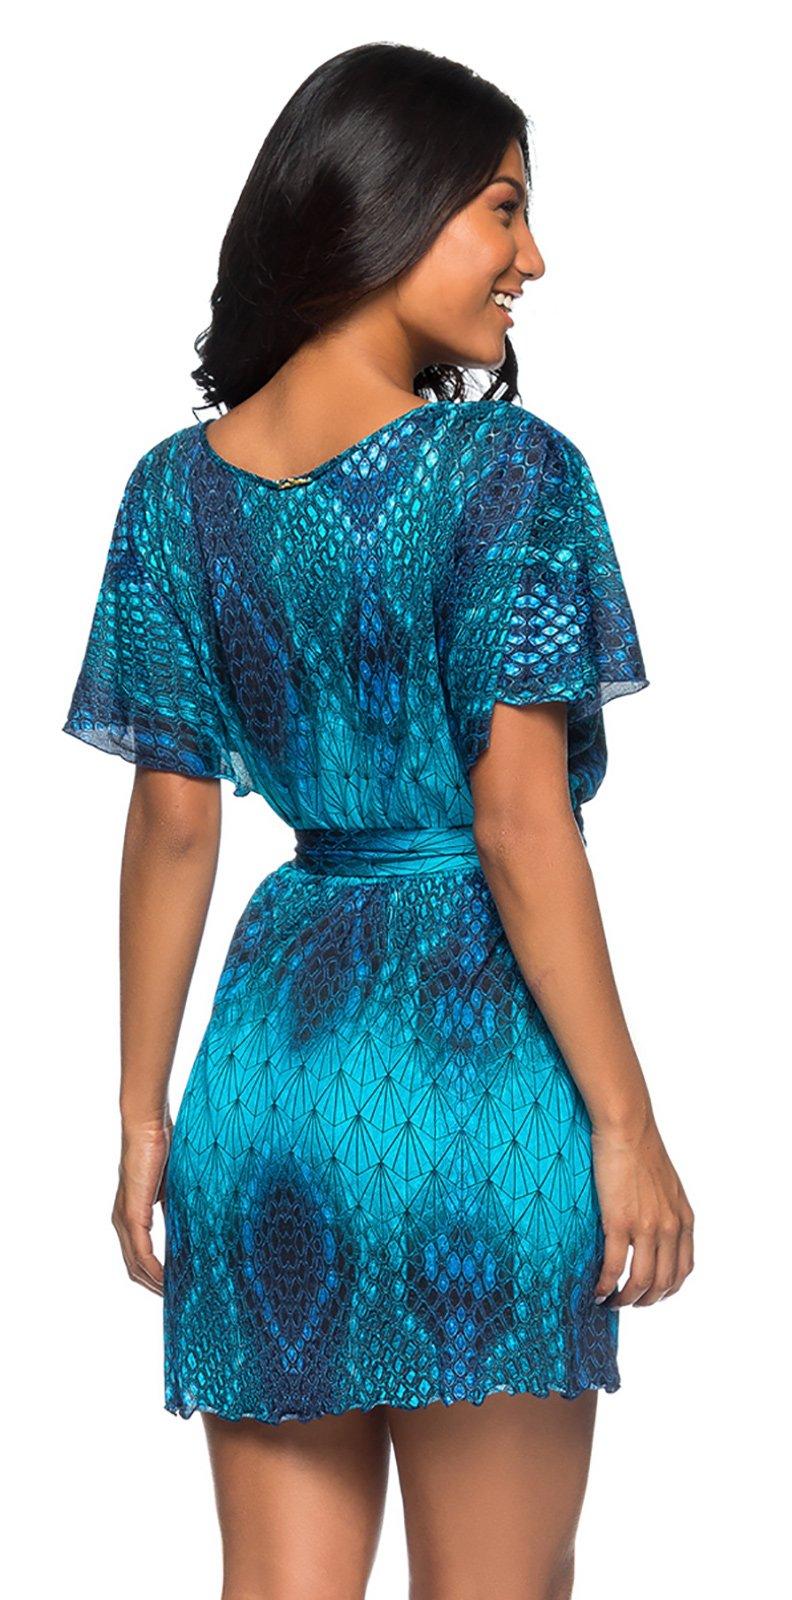 18043756ff0 Dress Short Wallet Dress With A Blue Print - Vestido Diamond